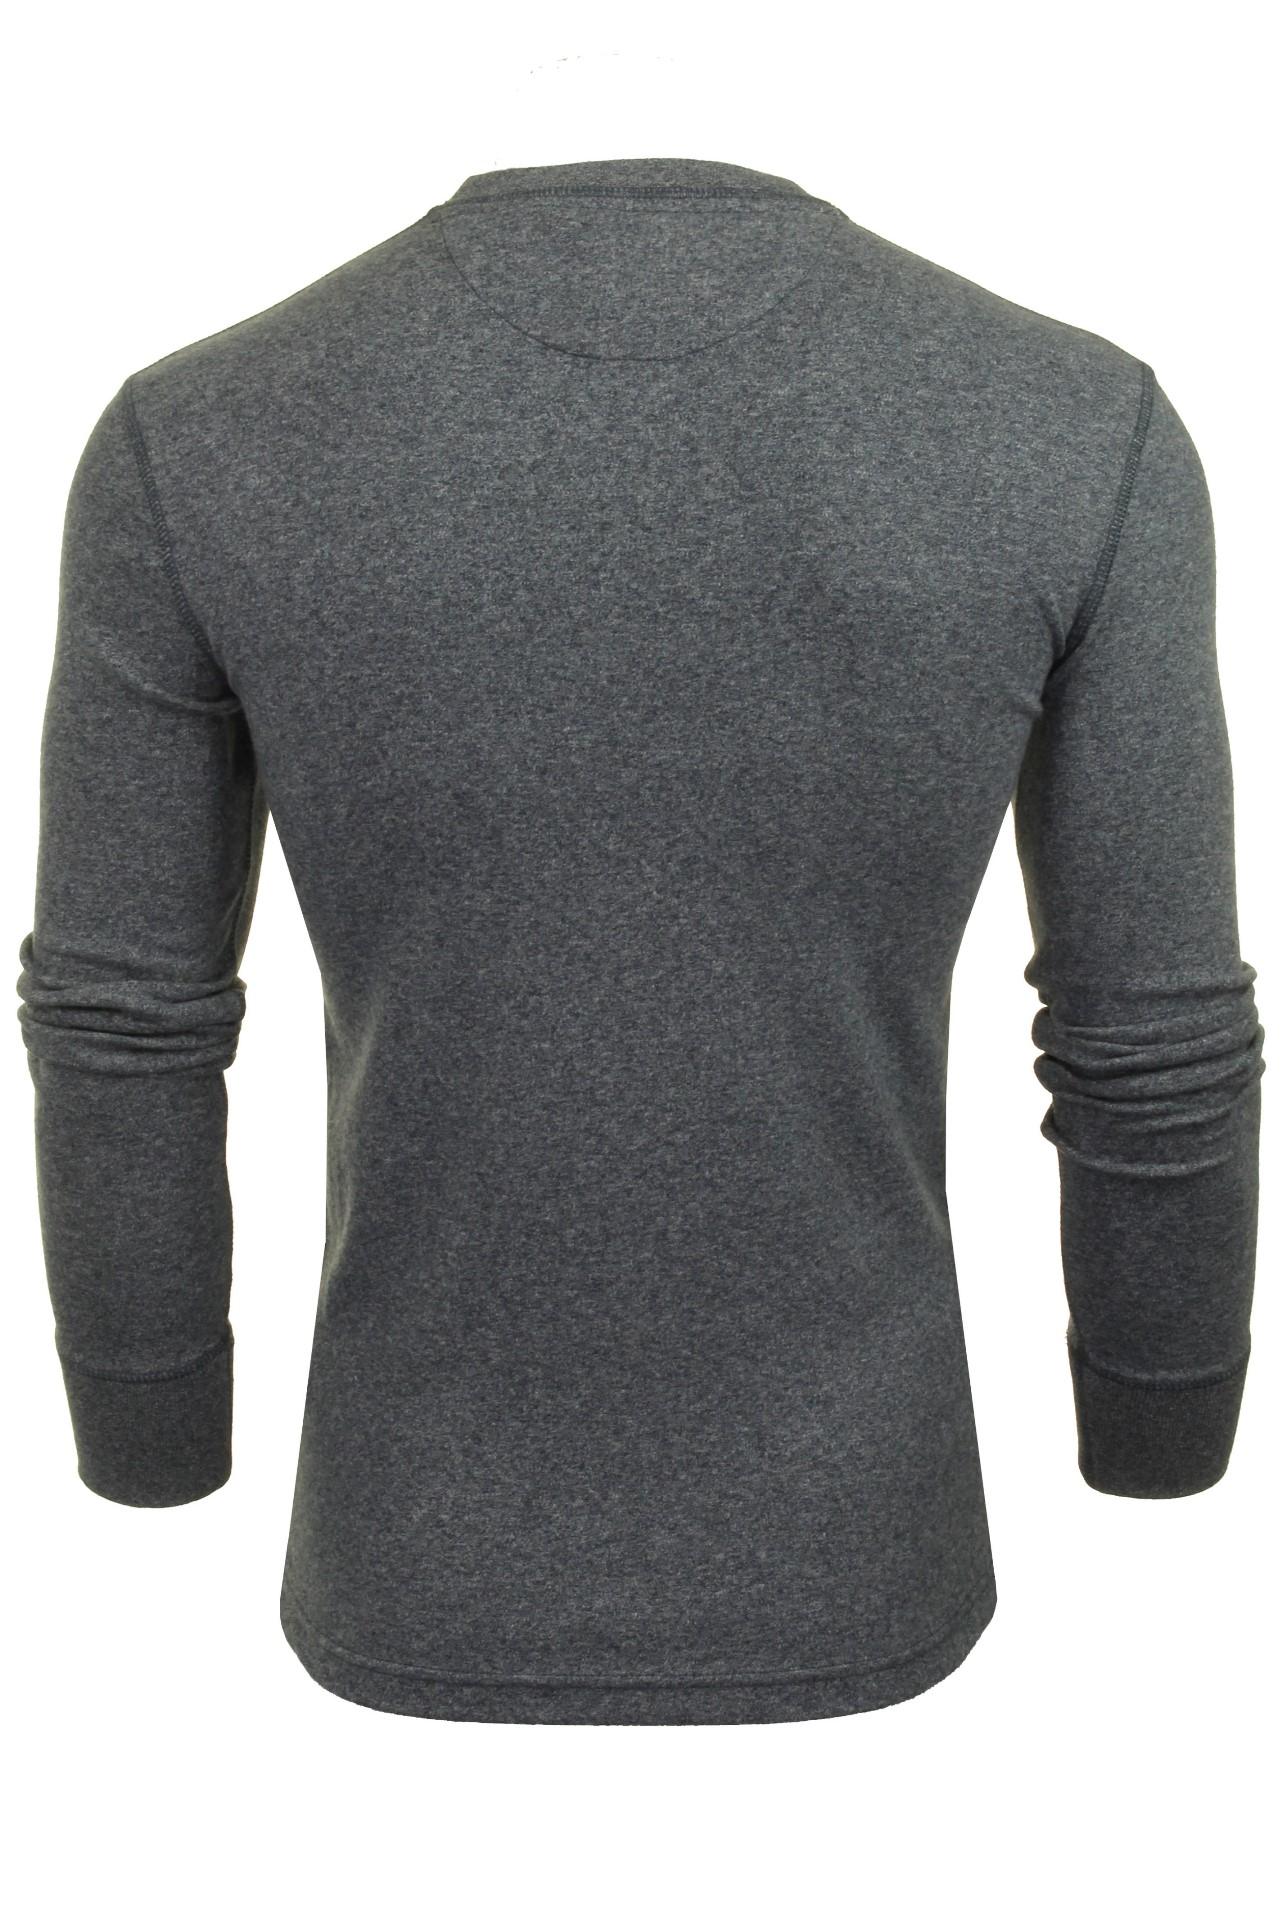 Camisa-de-manga-larga-patrimonio-039-039-Abuelo-T-Shirt miniatura 11